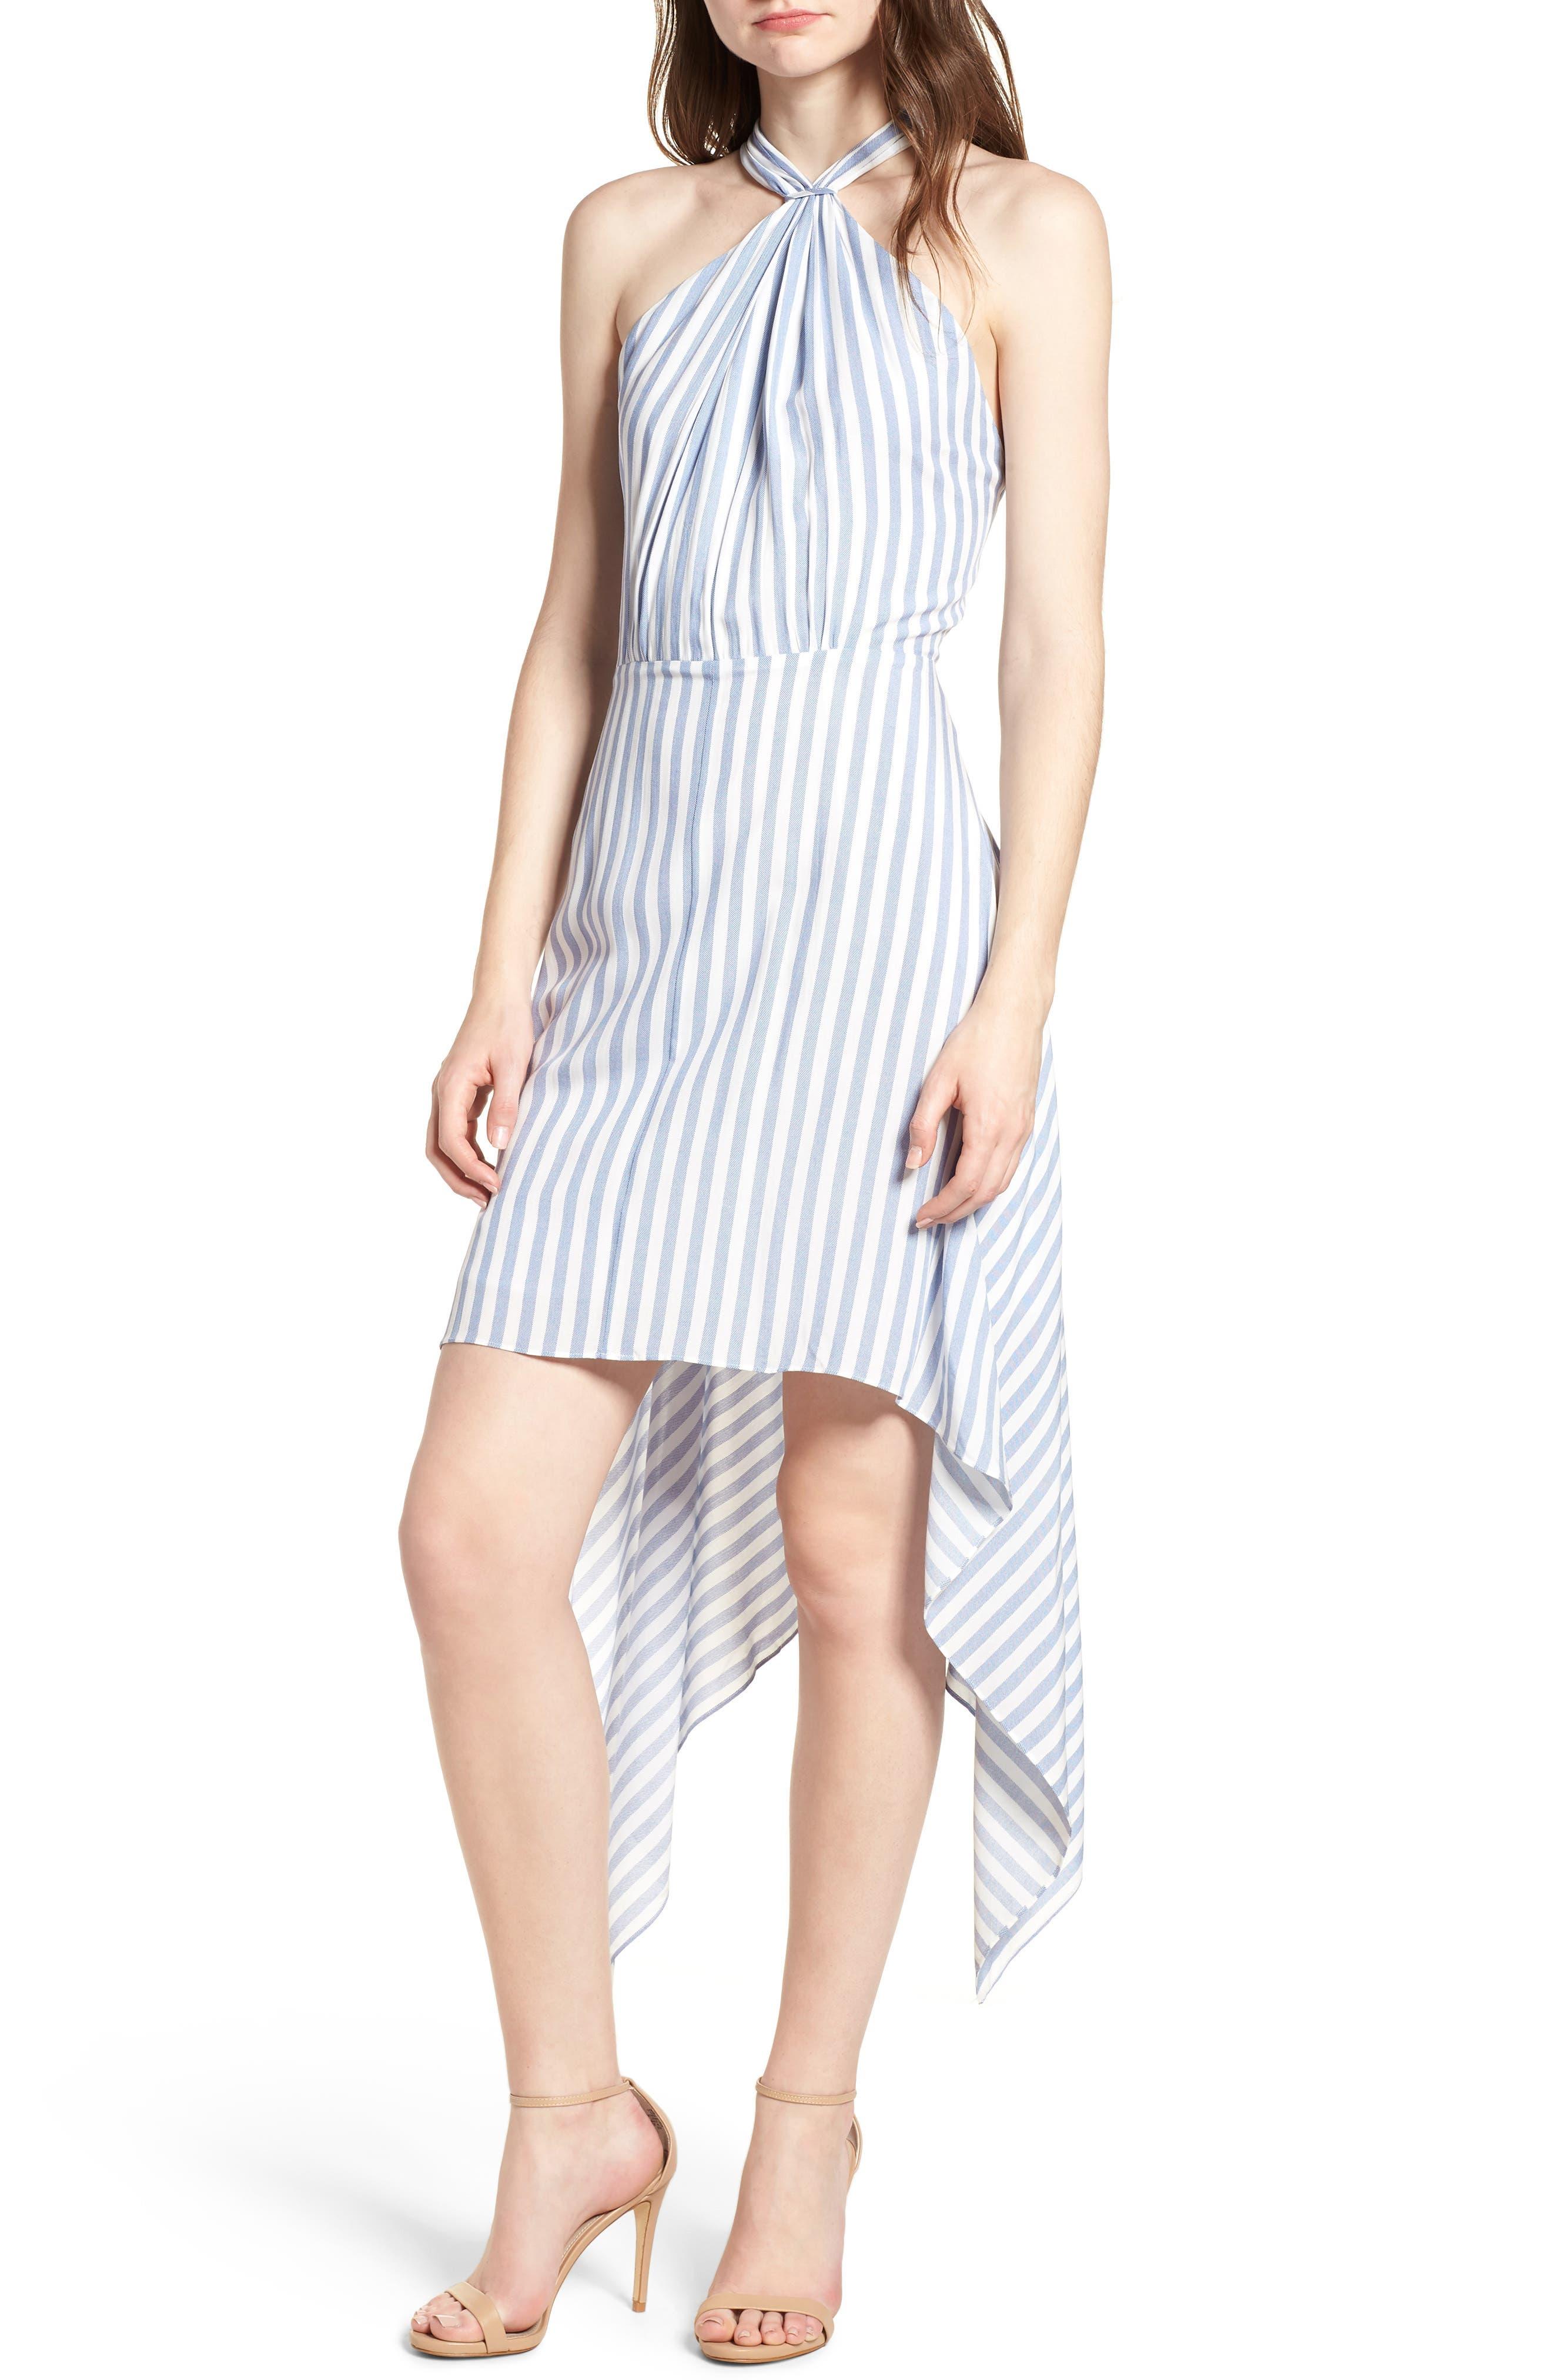 Bishop + Young Ana Stripe Shark Bite Hem Halter Dress,                             Main thumbnail 1, color,                             Blue White Stripe